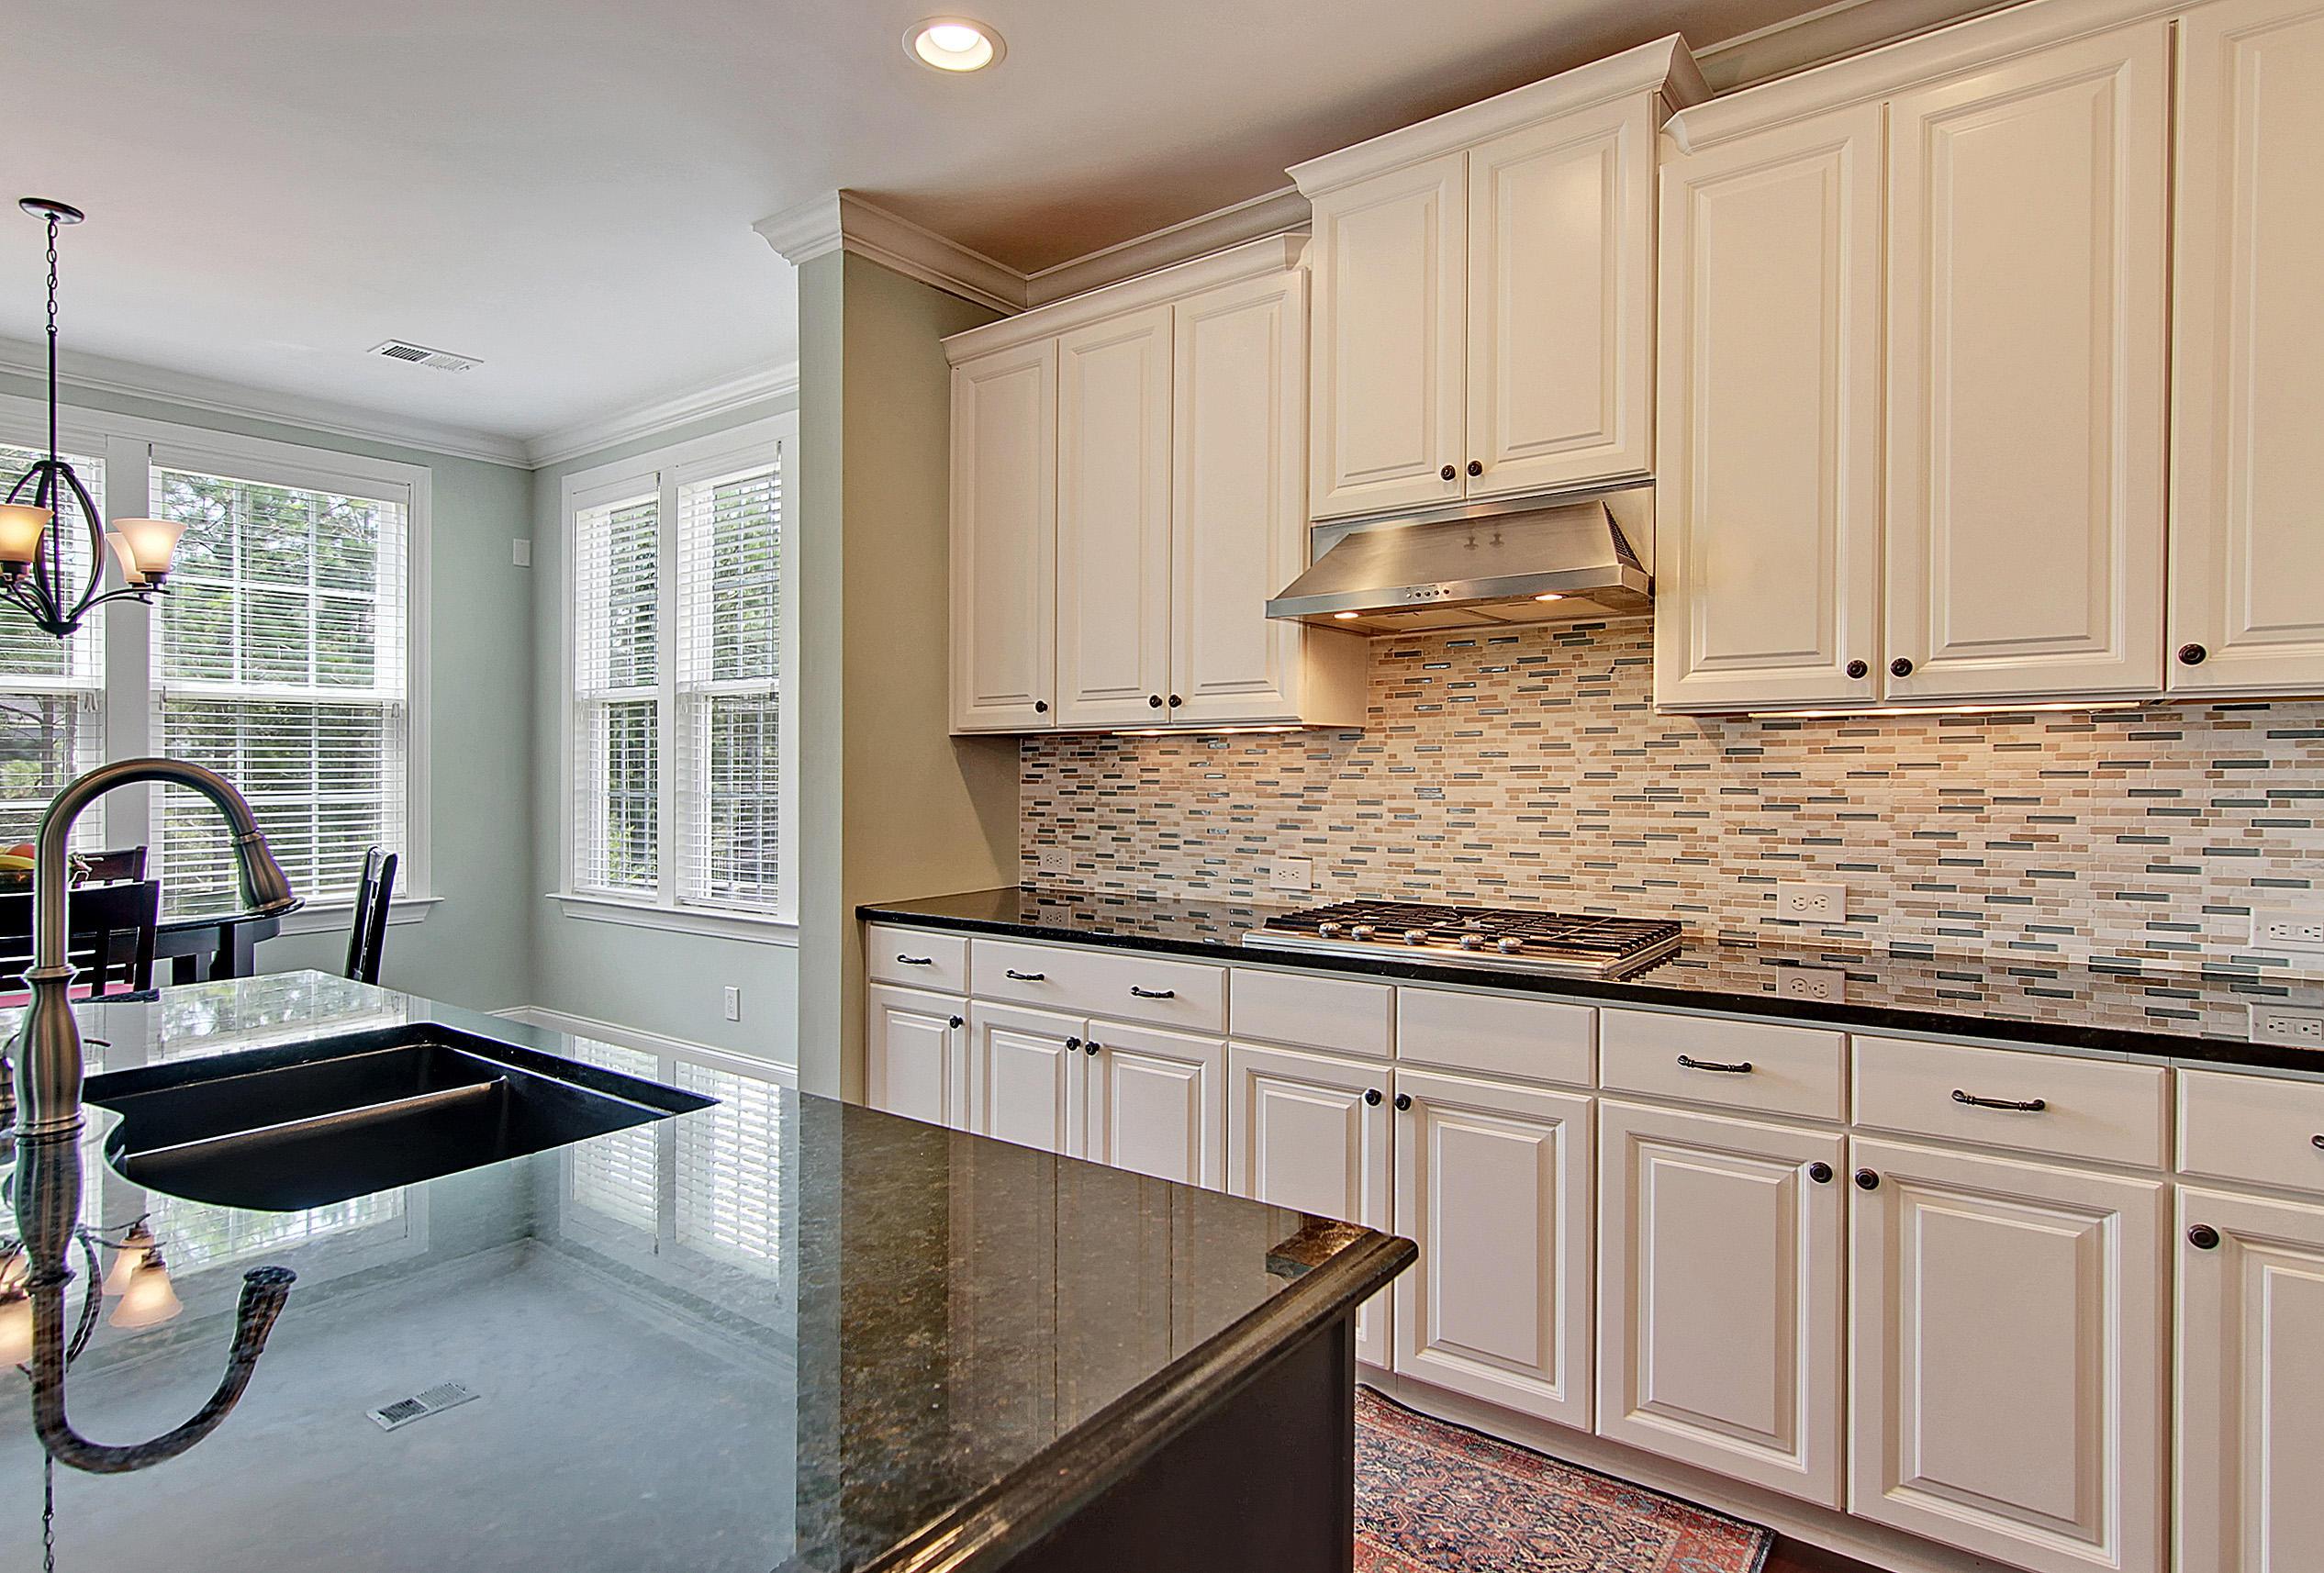 Dunes West Homes For Sale - 1332 Whisker Pole, Mount Pleasant, SC - 20